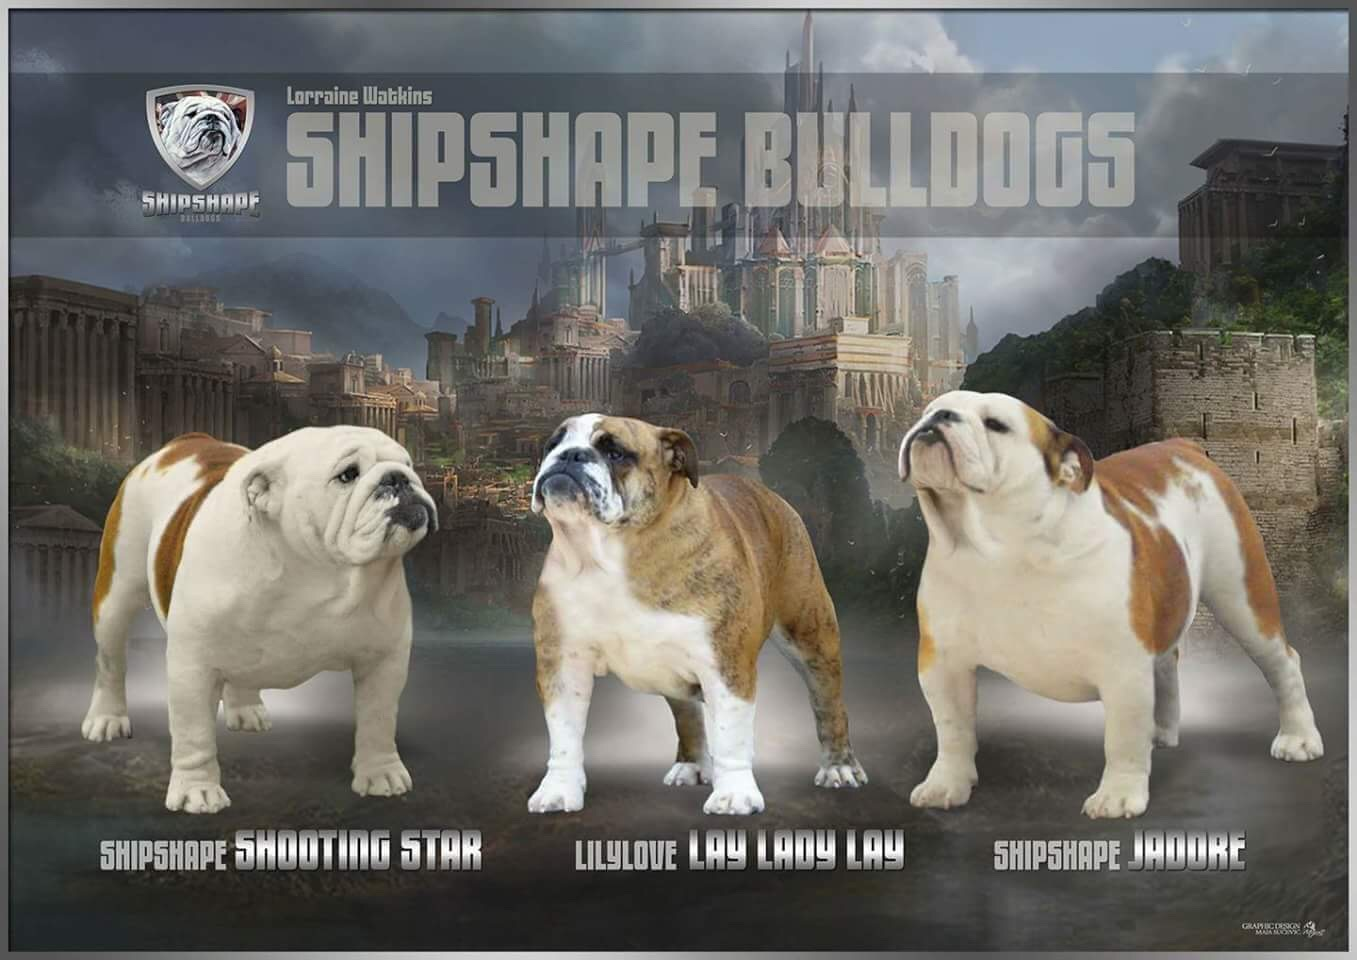 Collectibulldogs.com